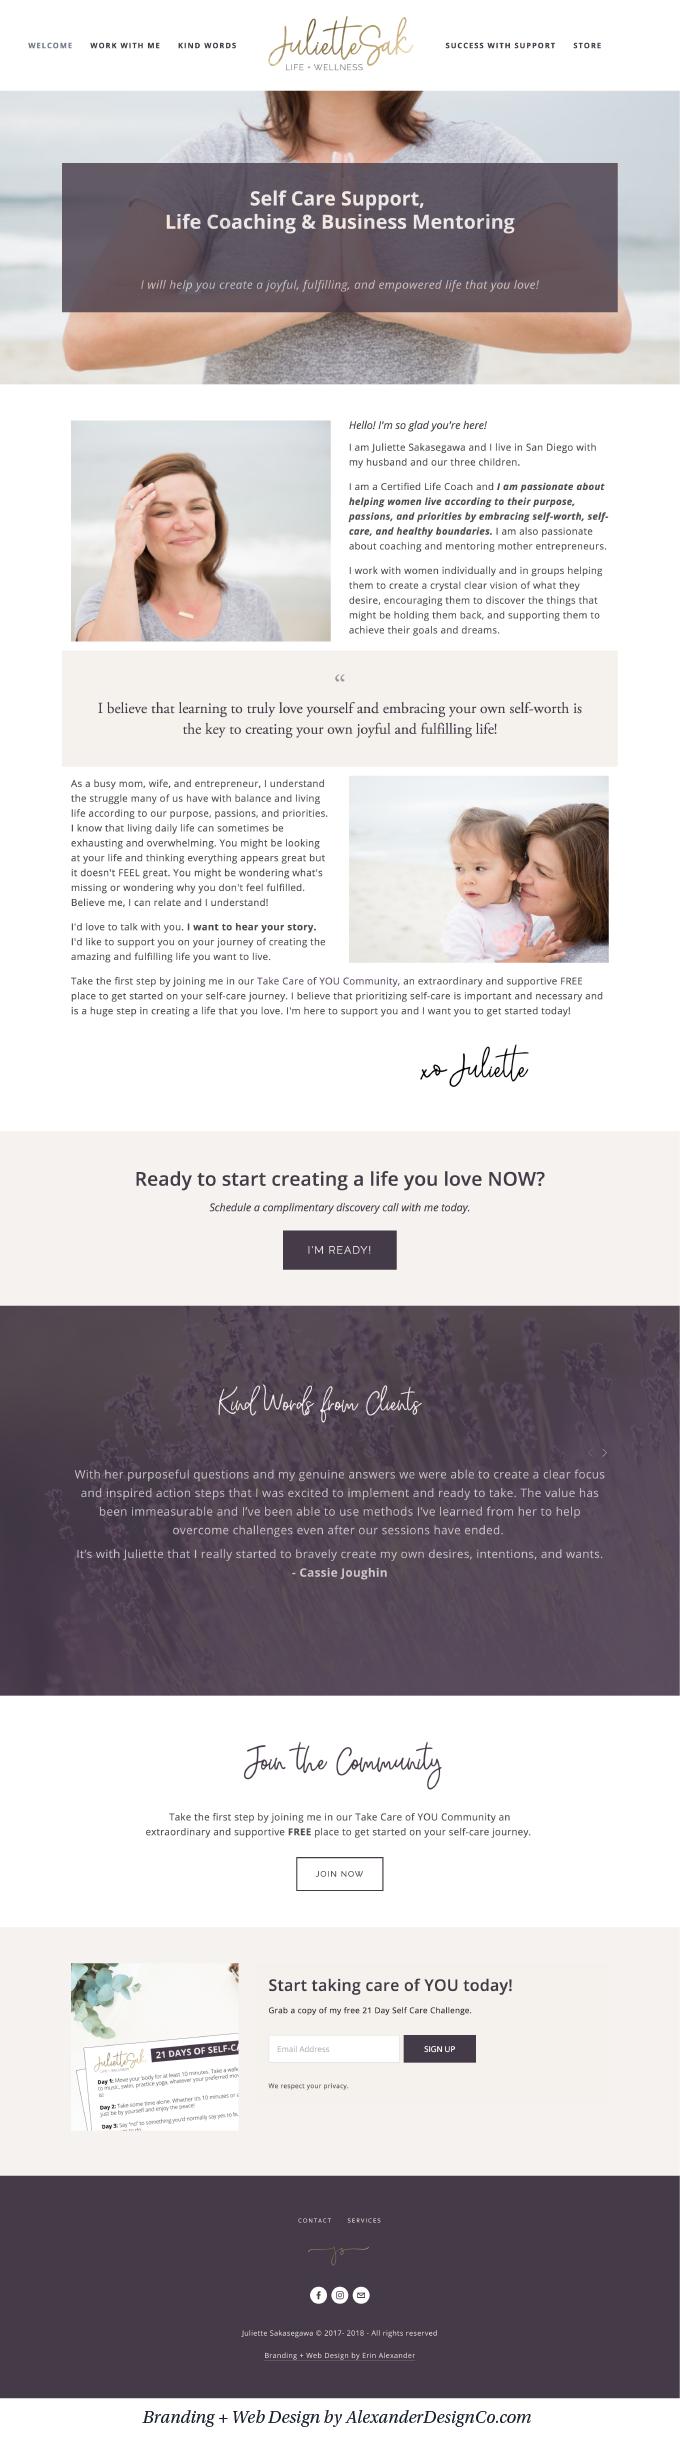 Erin Alexander - JulietteSak Life and Wellness Squarespace Web designer - Alexander Design Co.png